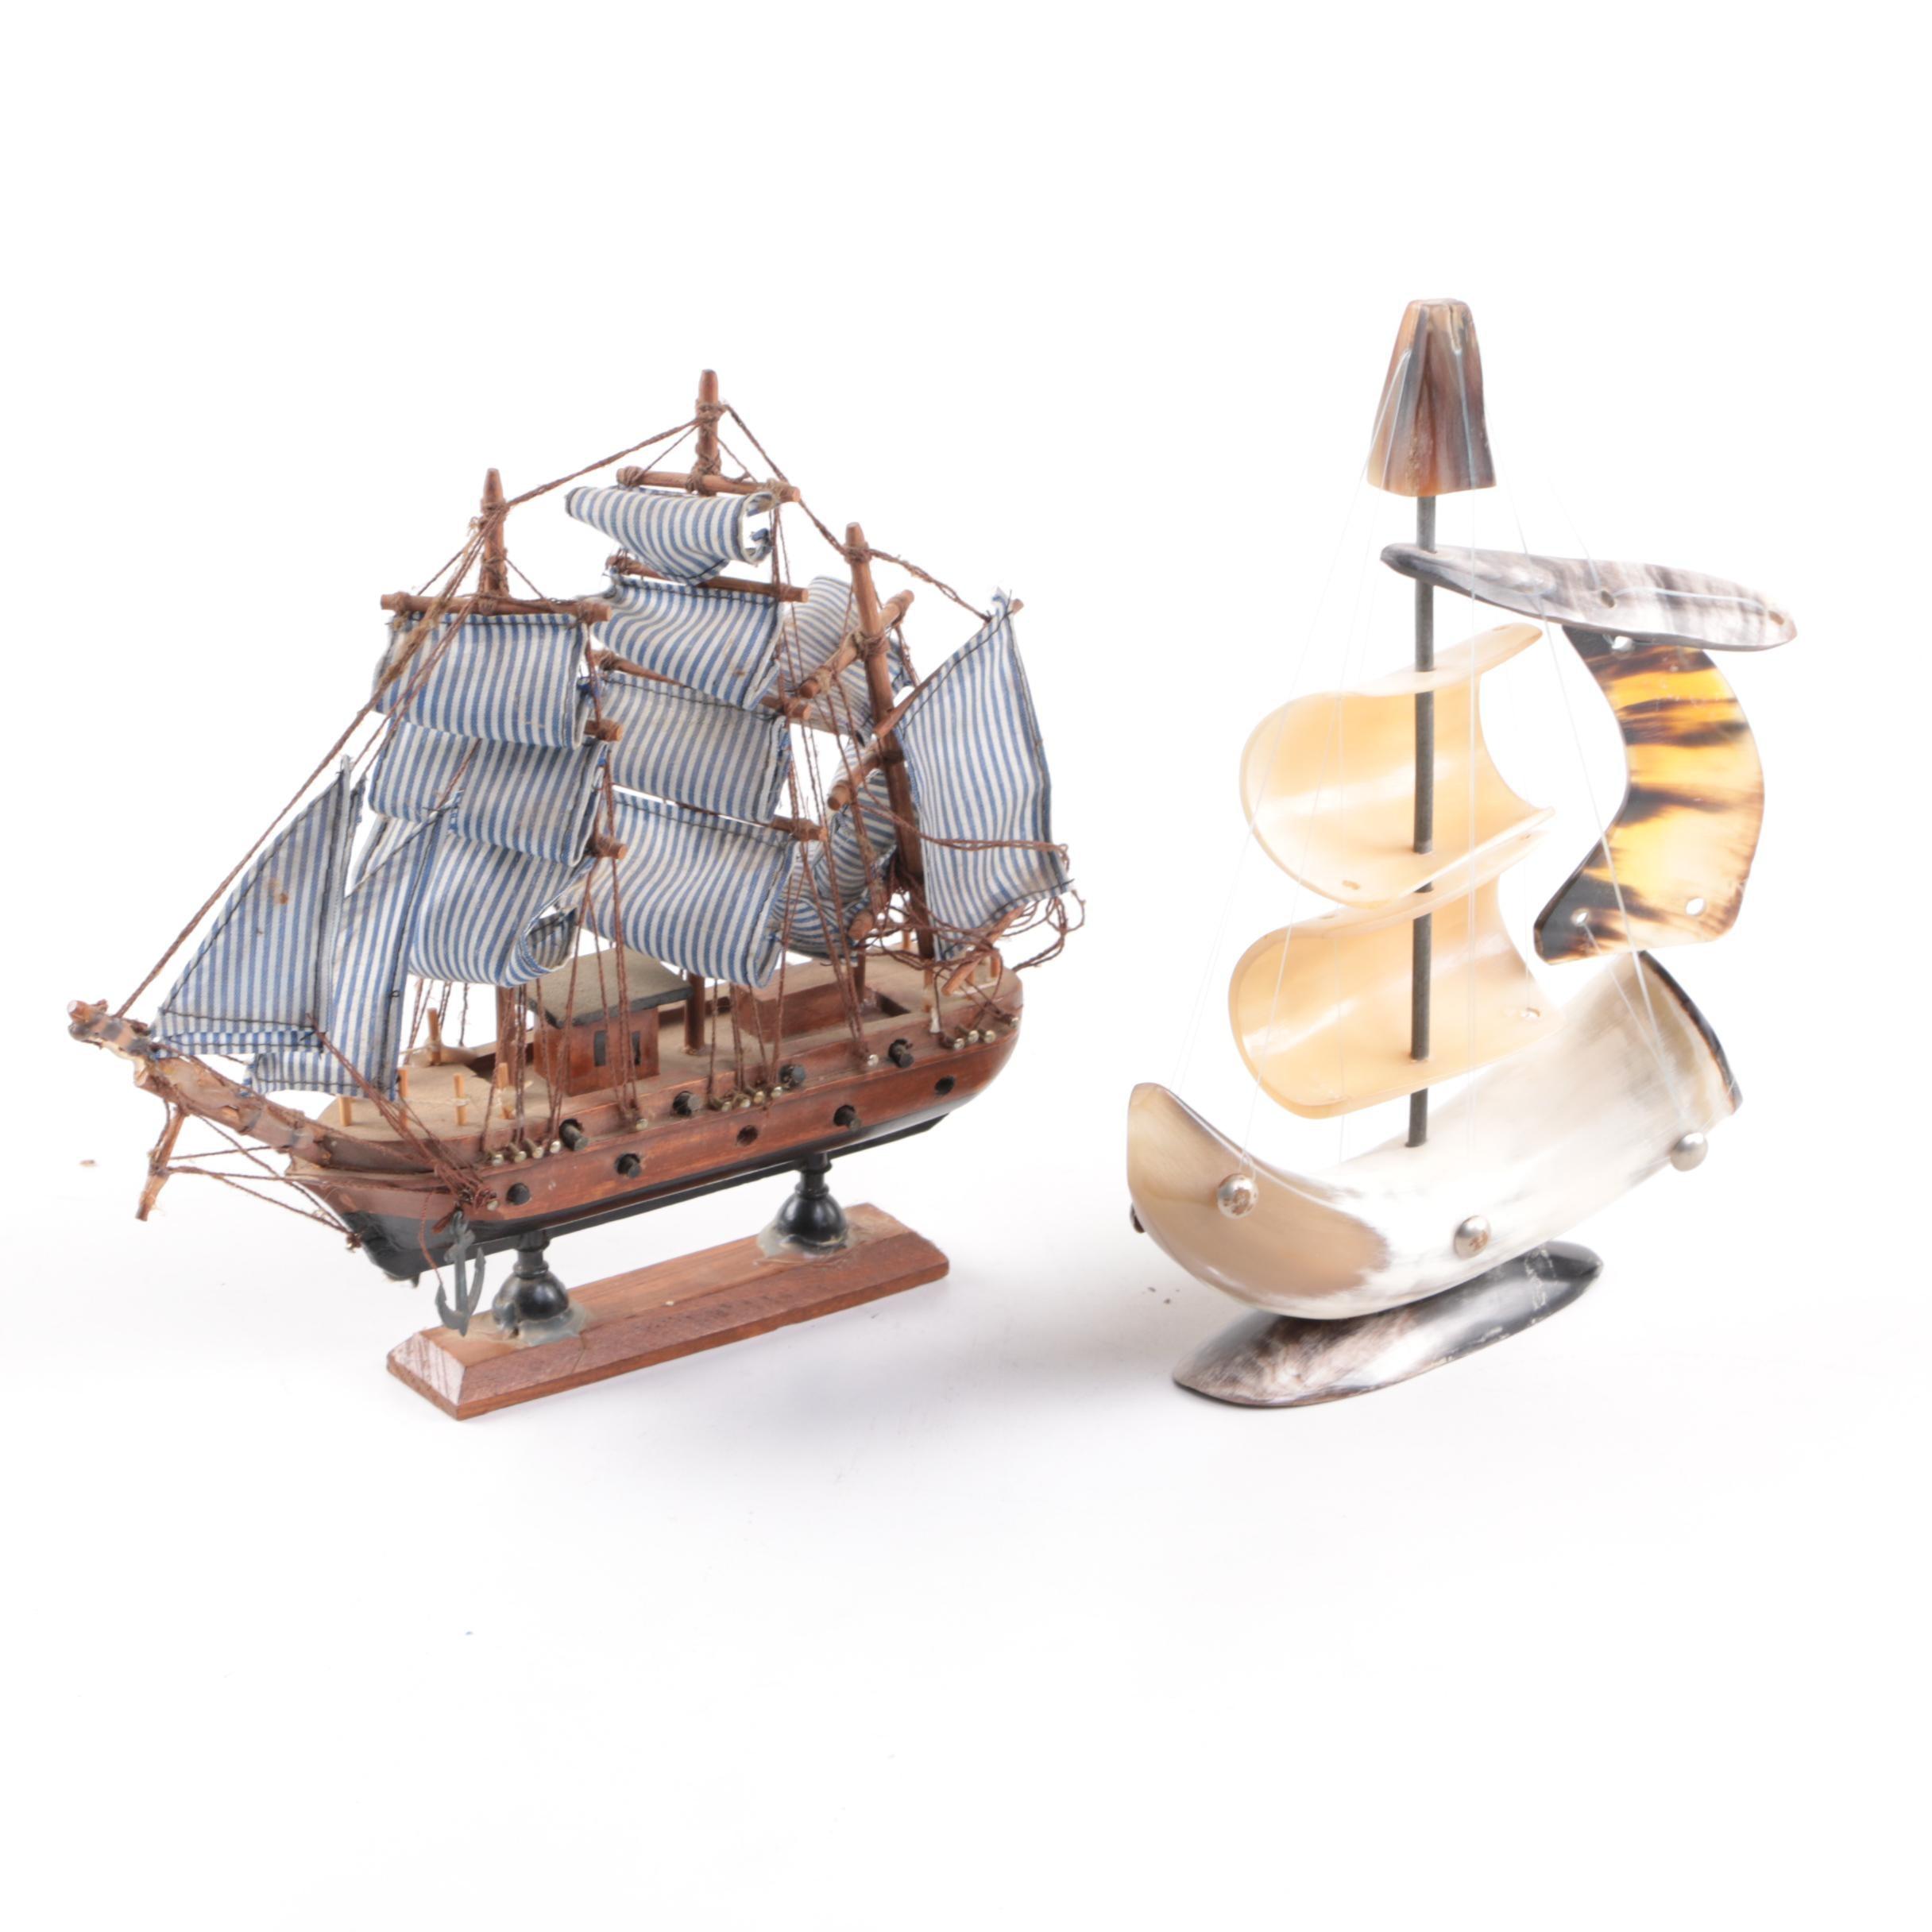 Assorted Decorative Miniature Ships